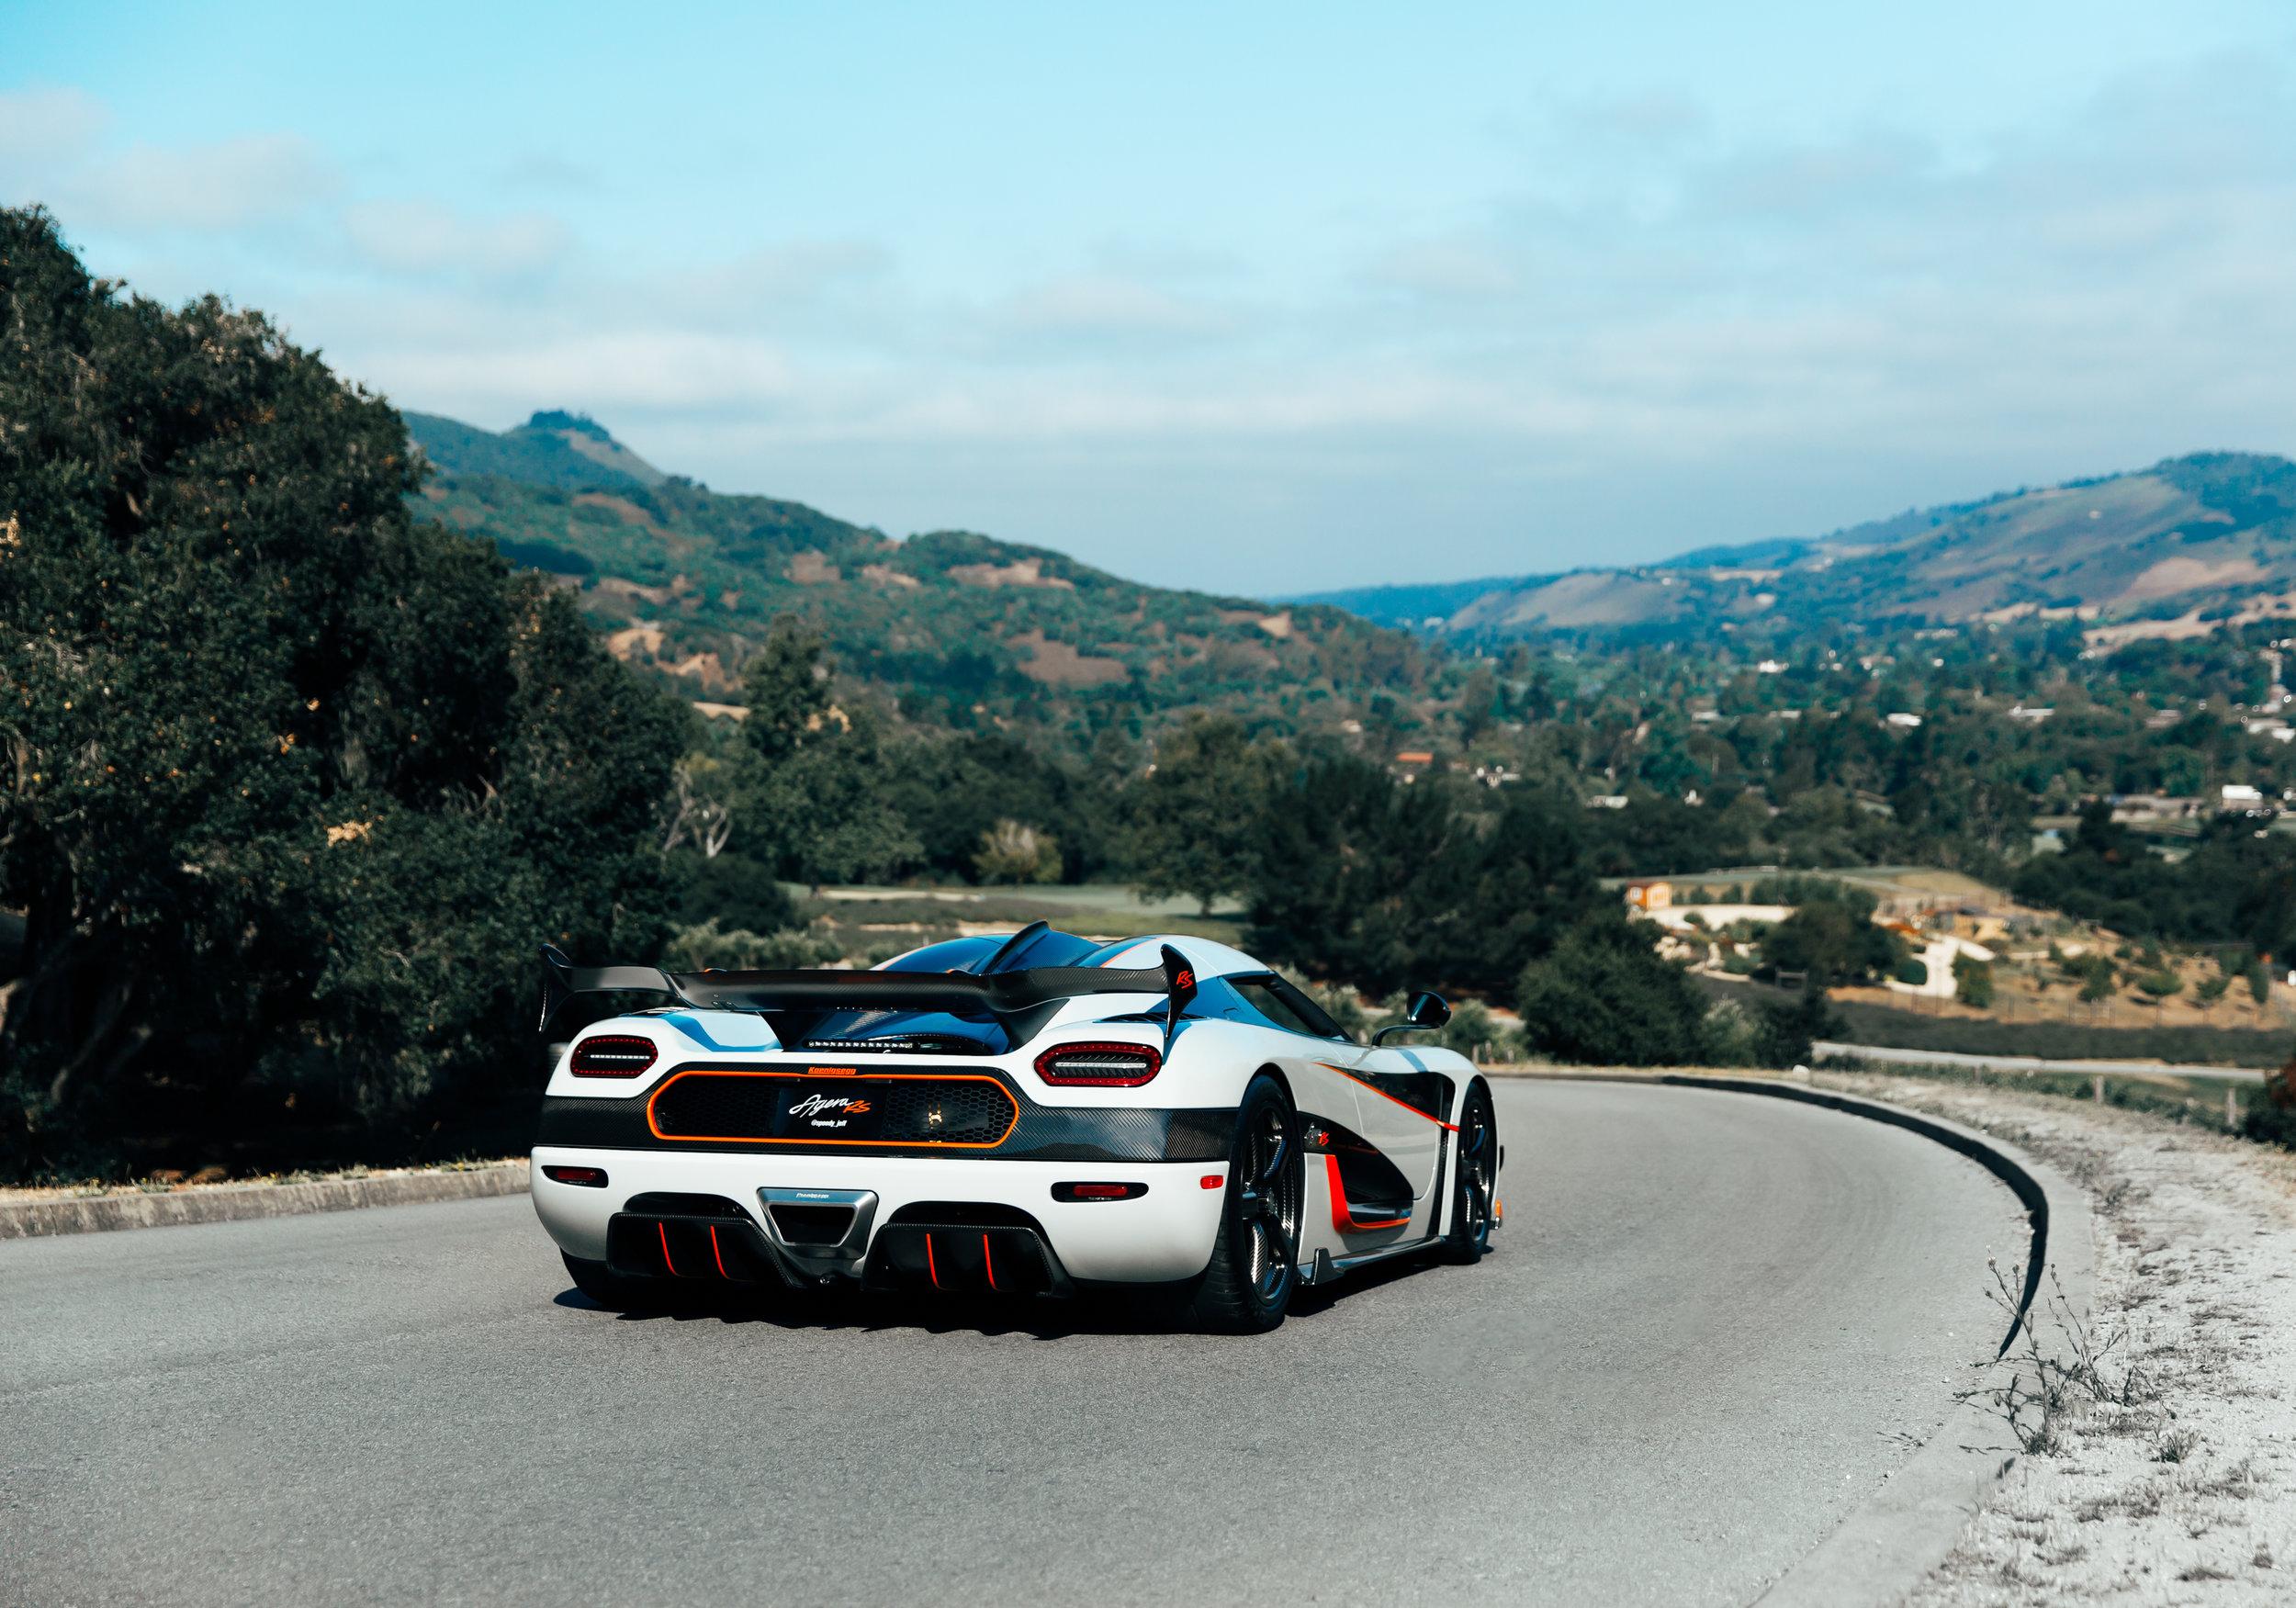 Stay_Driven_Monterey_Car_Week_Koenigsegg-16.jpg